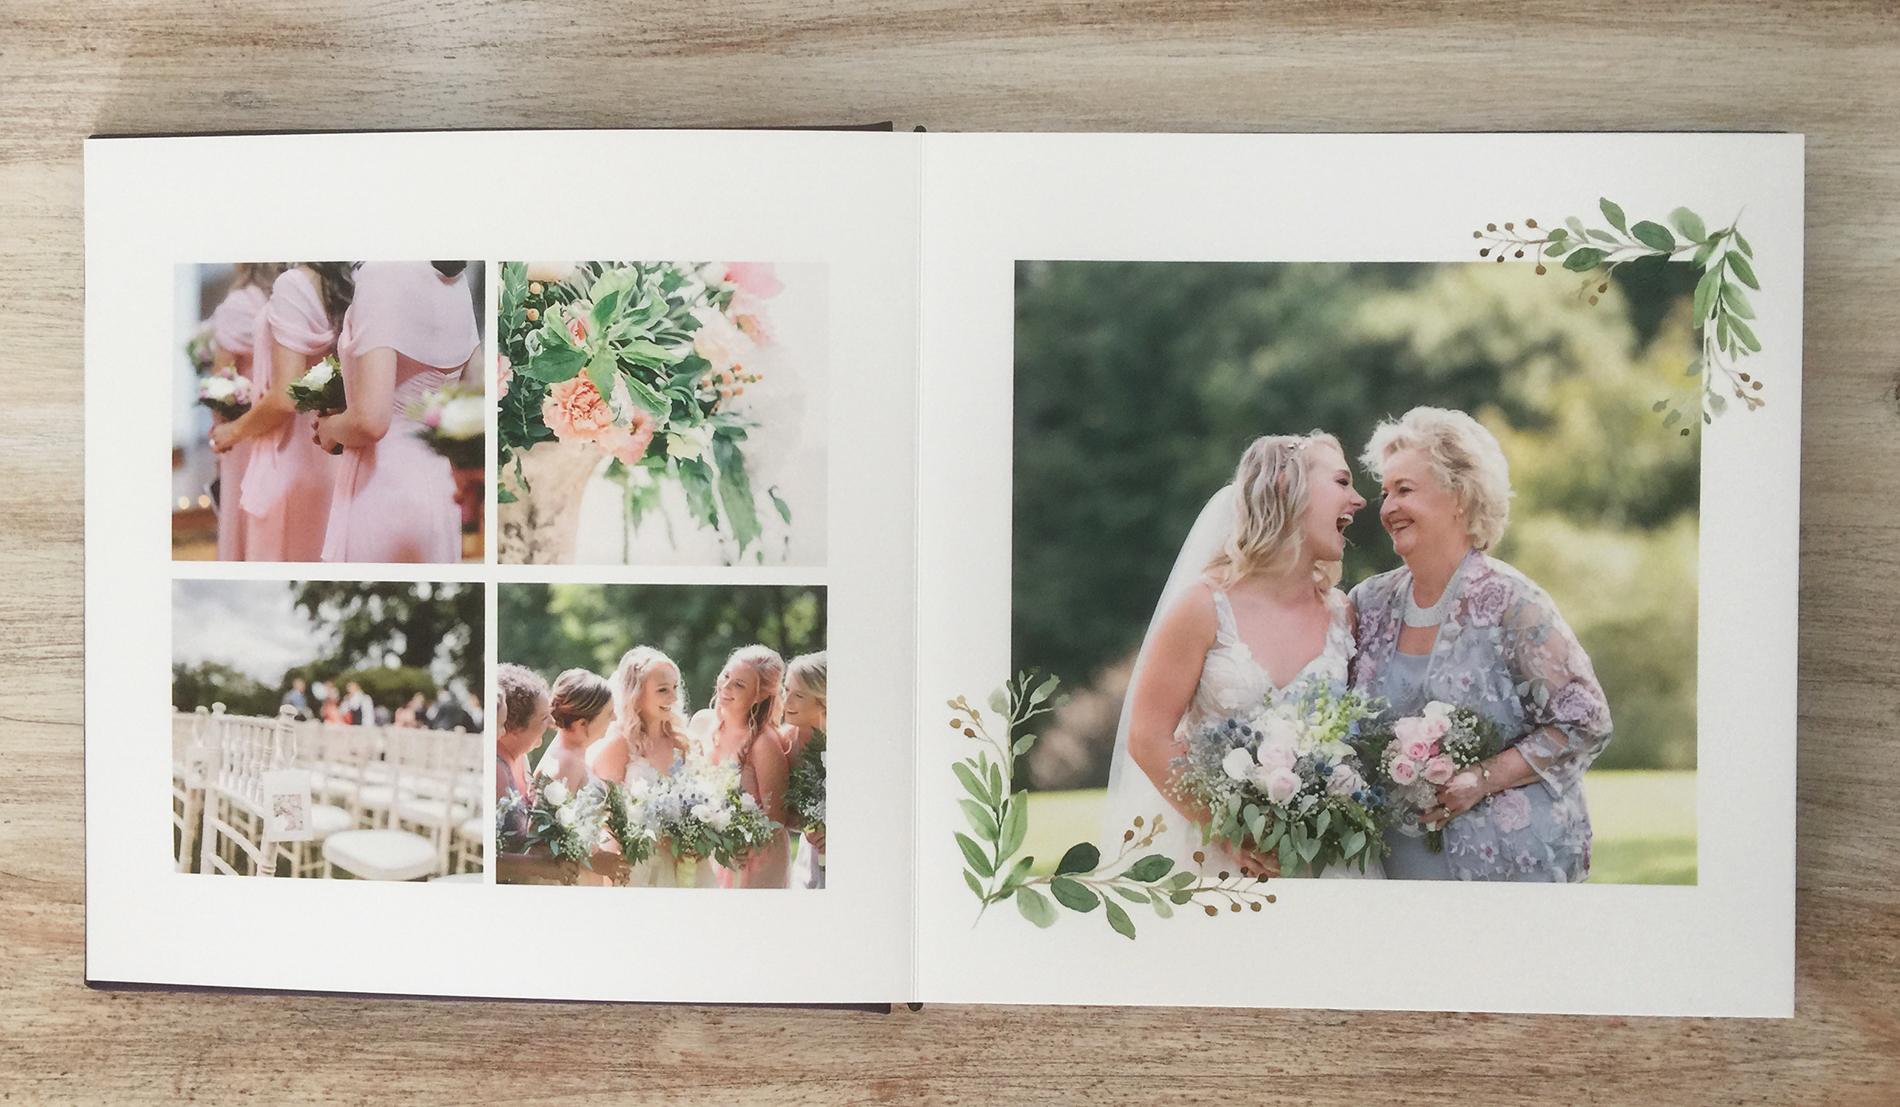 Create Your Own Wedding Photo Album And Save Money Honeyfund Com